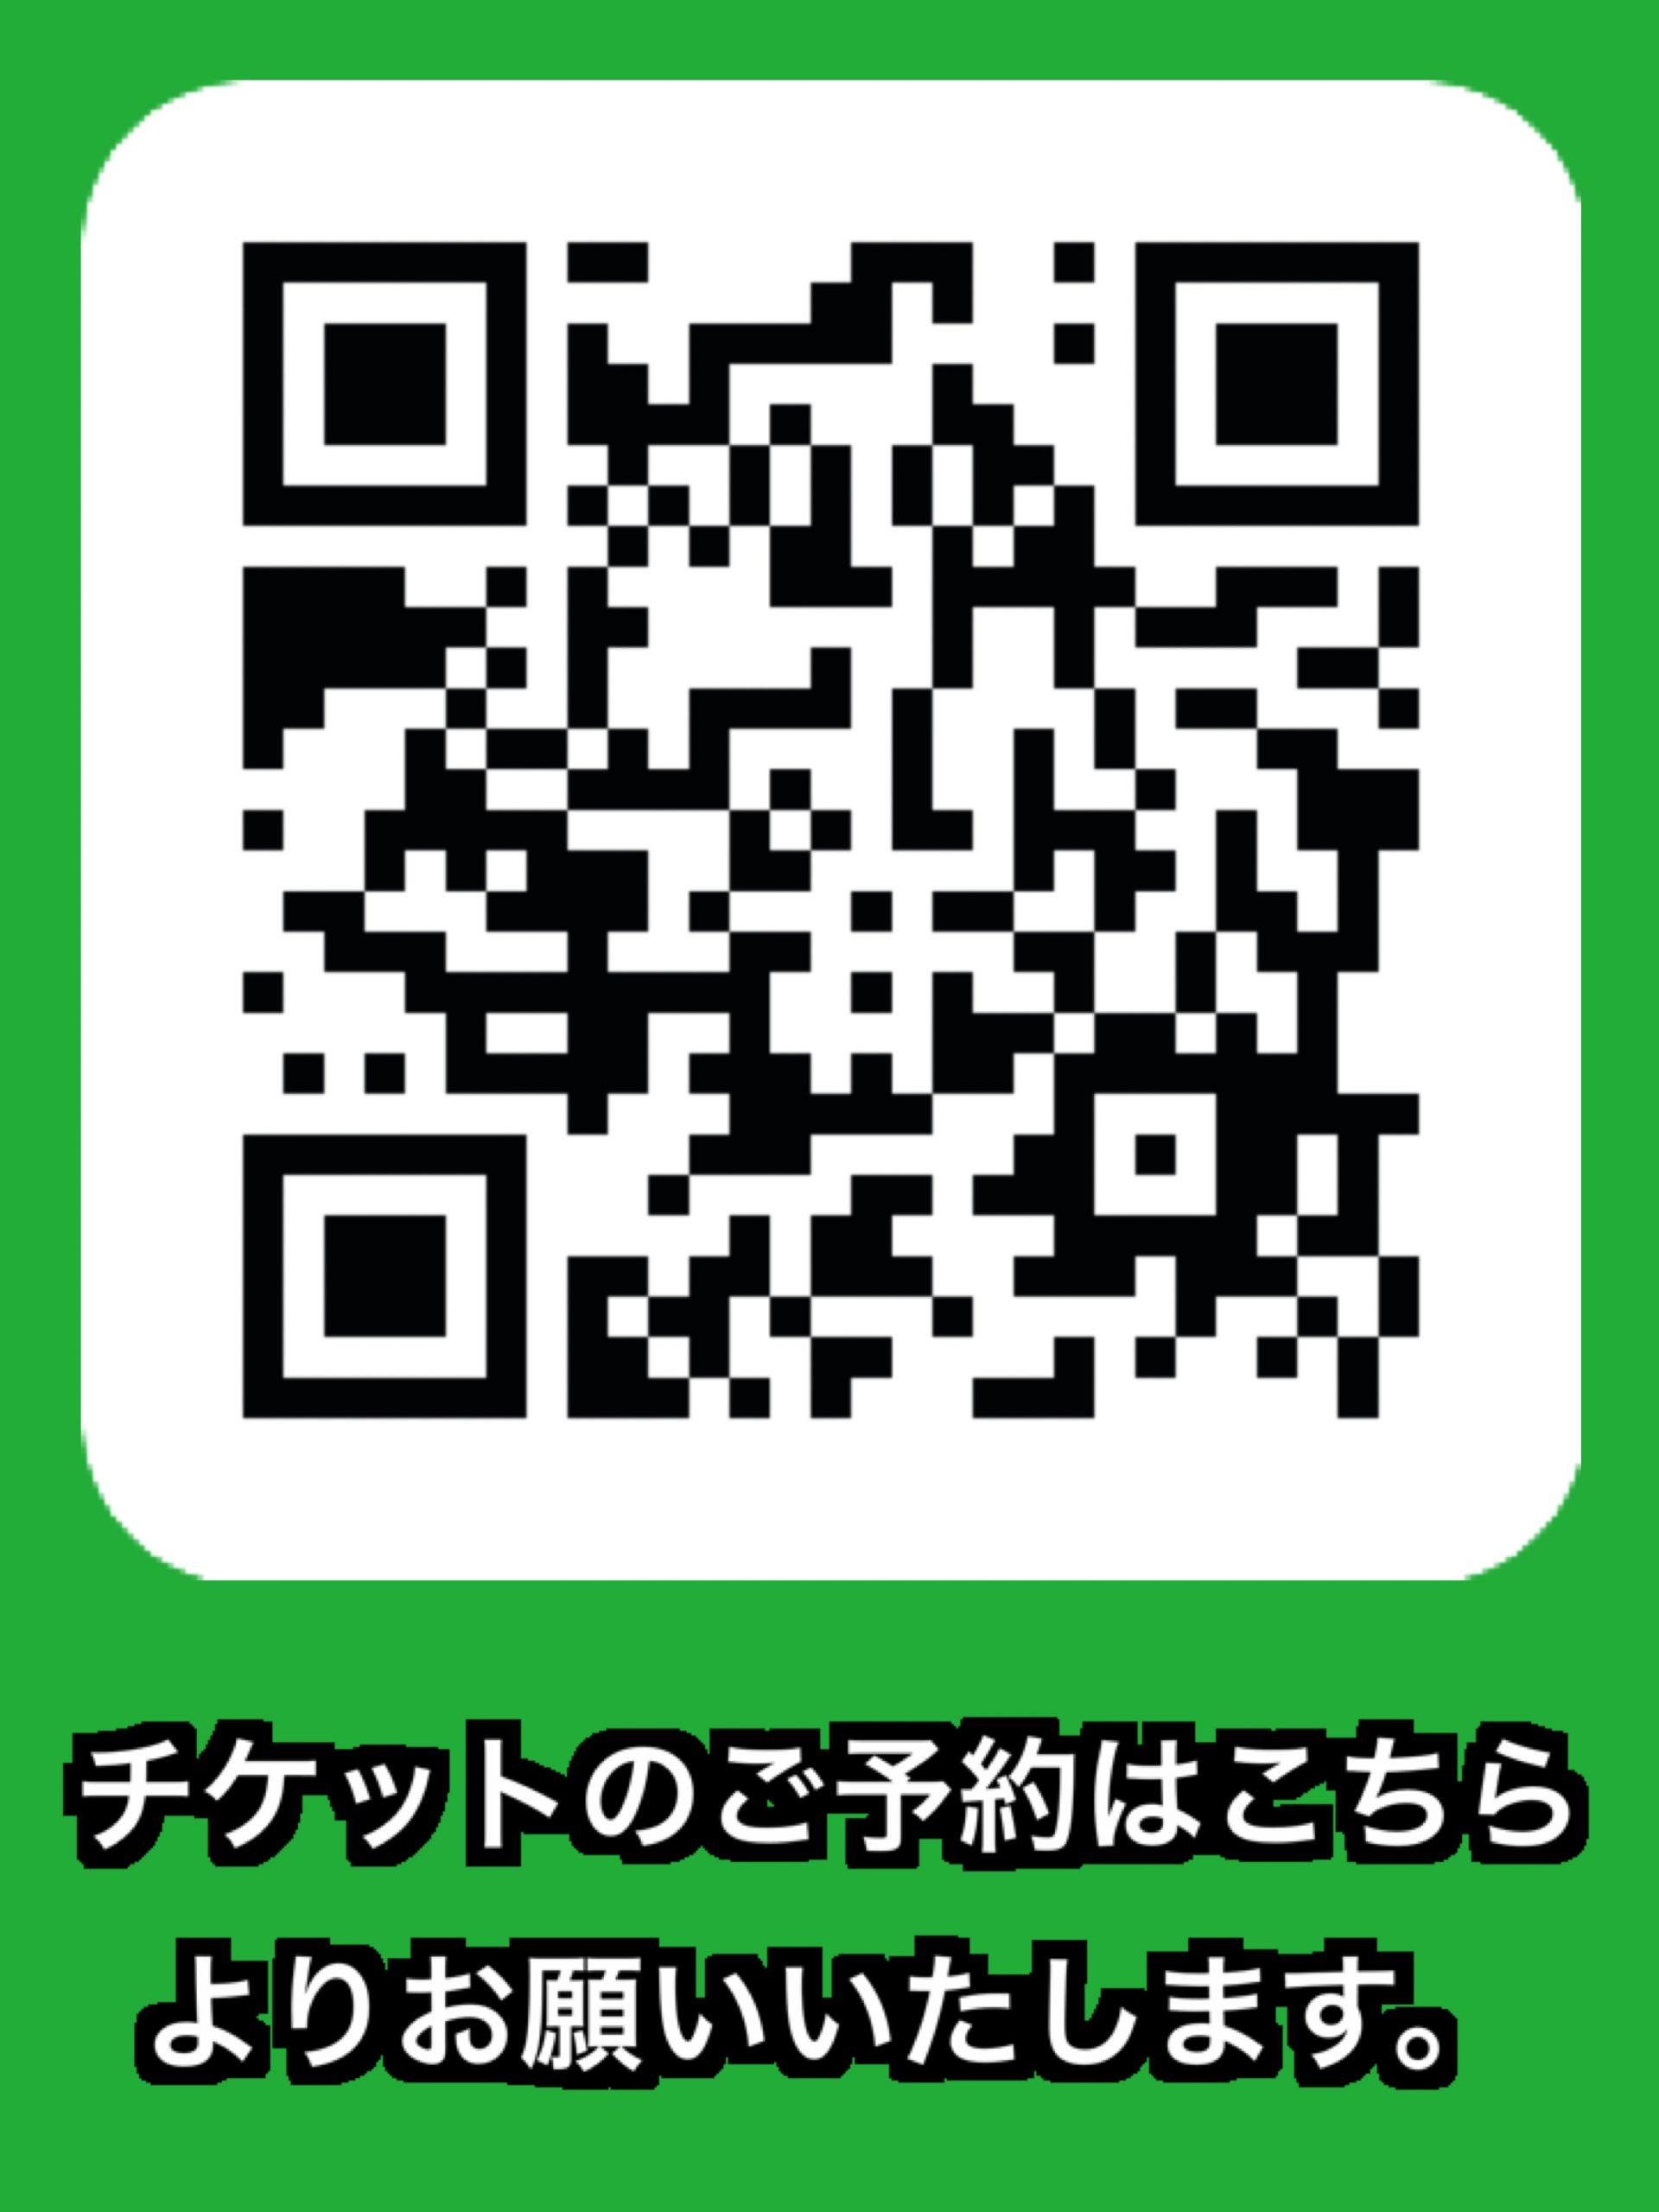 高松MONSTER 9周年祭